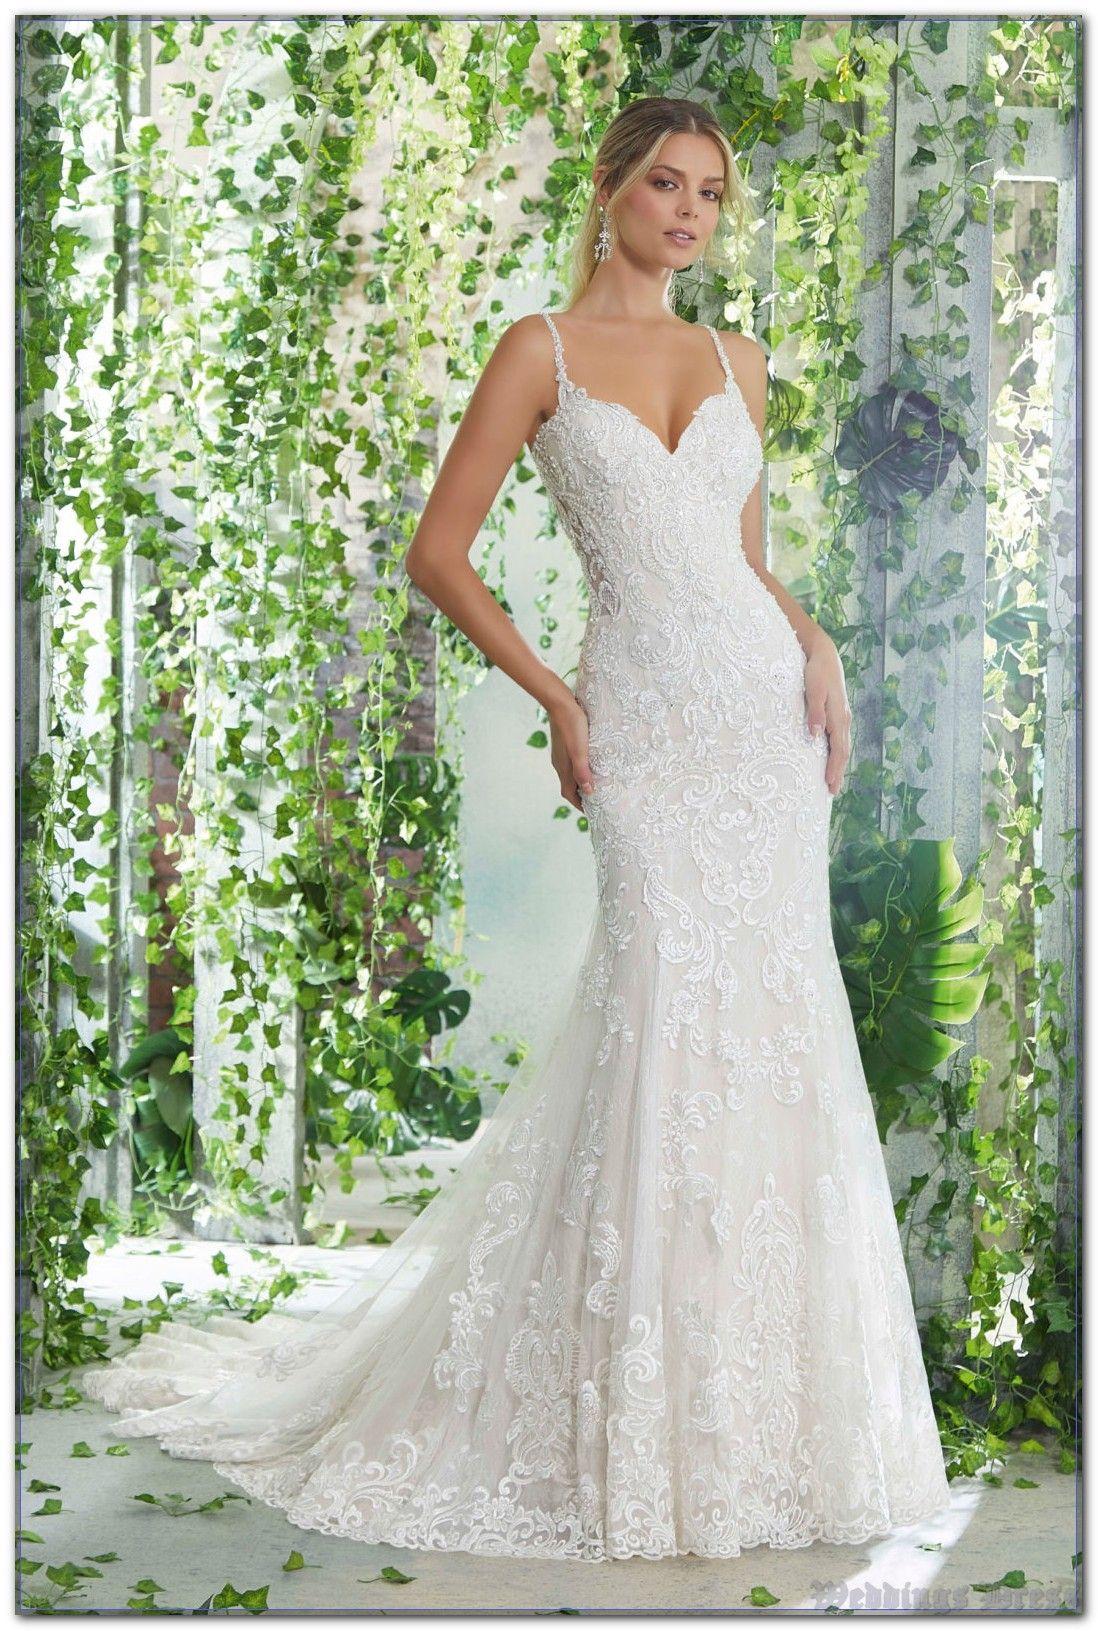 Where Is The Best Weddings Dress?